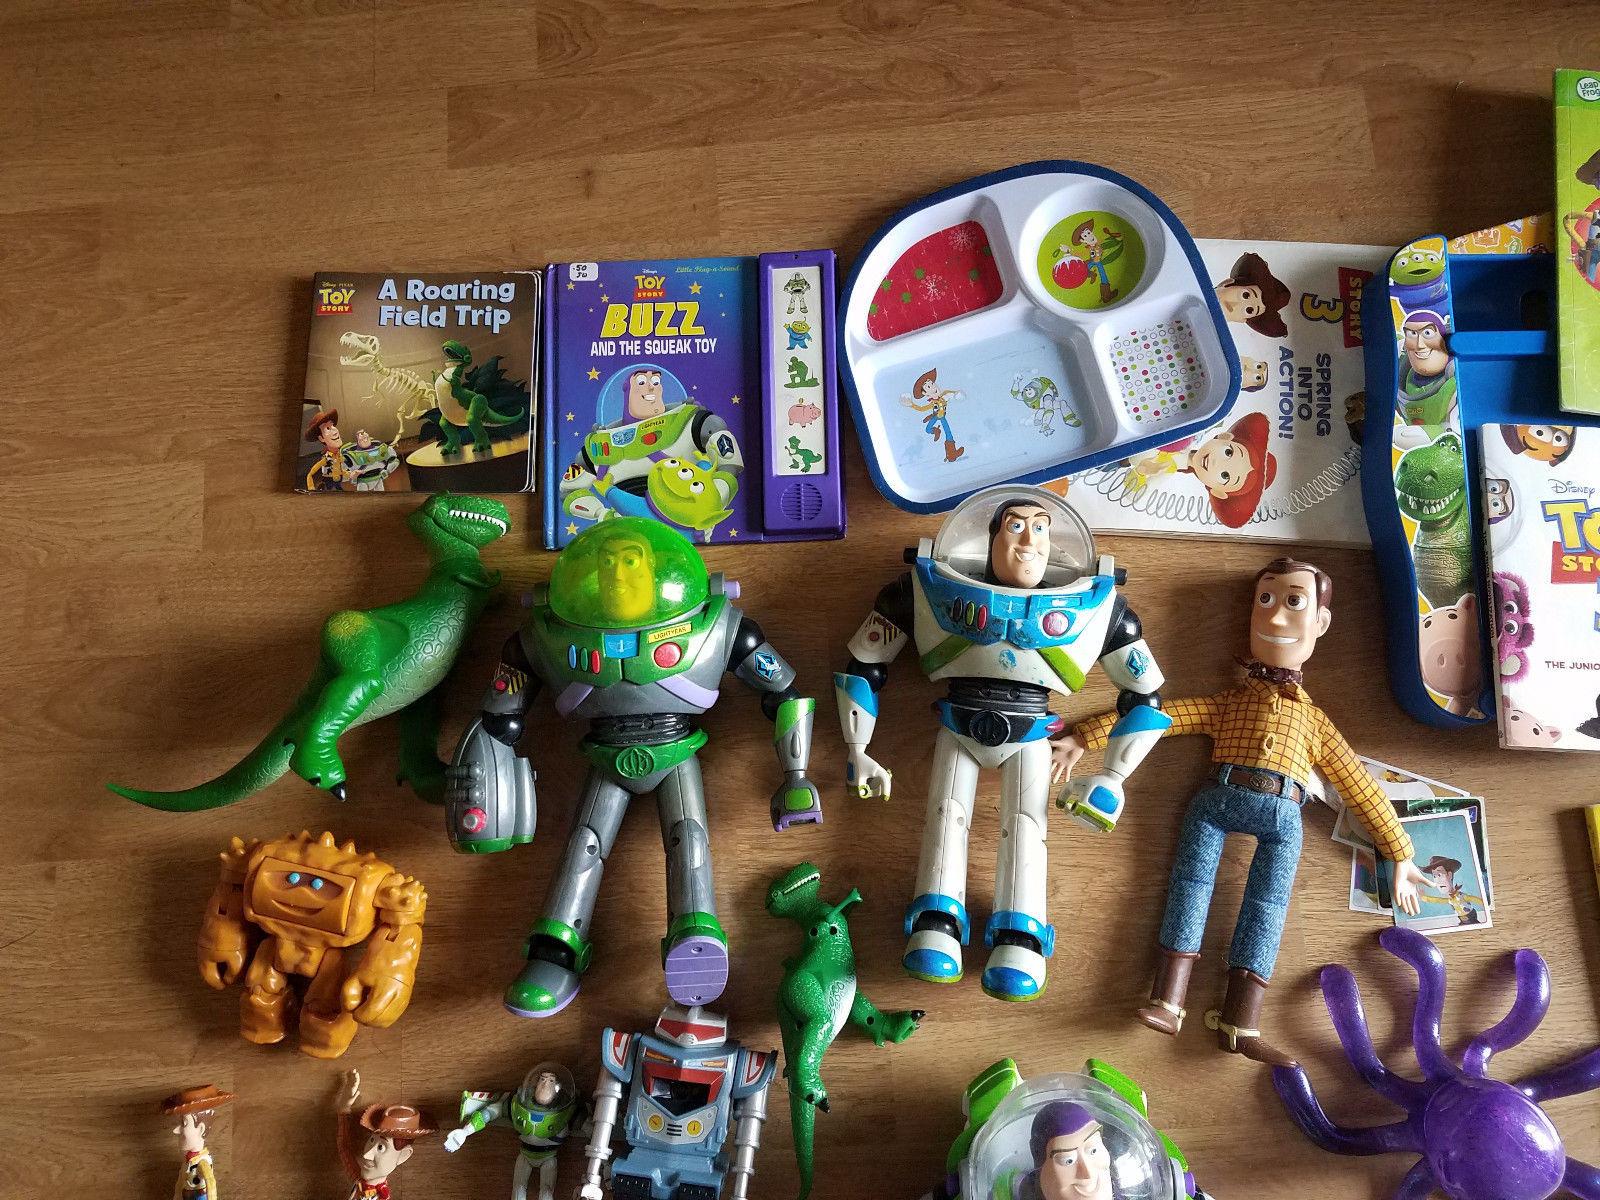 Disney PIXAR Toy Story 1 2 3 Figure Books Coloring Puzzle & MORE